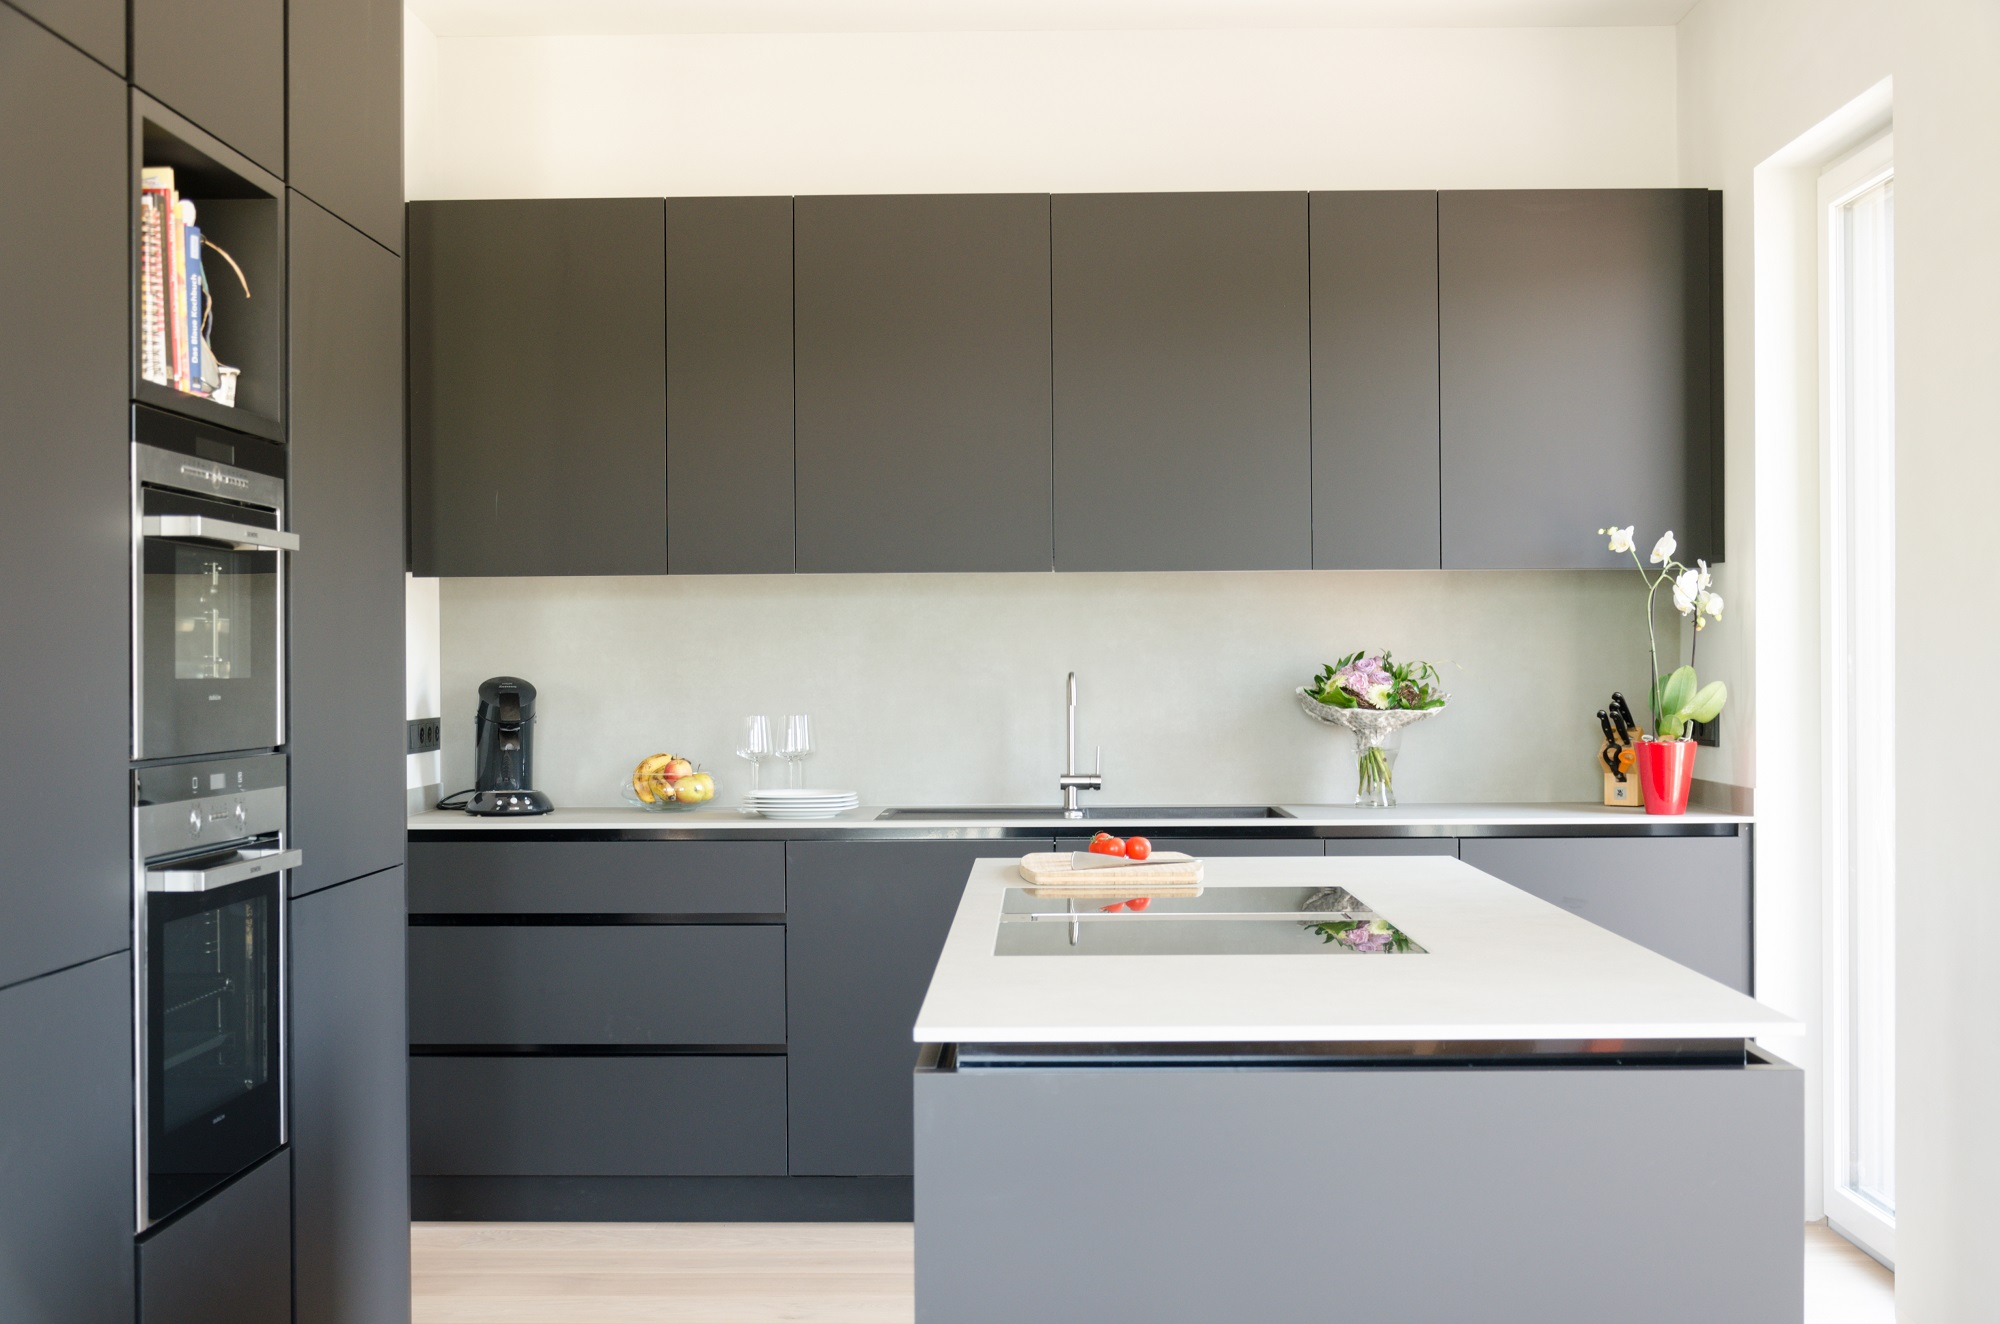 k che und badm bel in trier padati. Black Bedroom Furniture Sets. Home Design Ideas